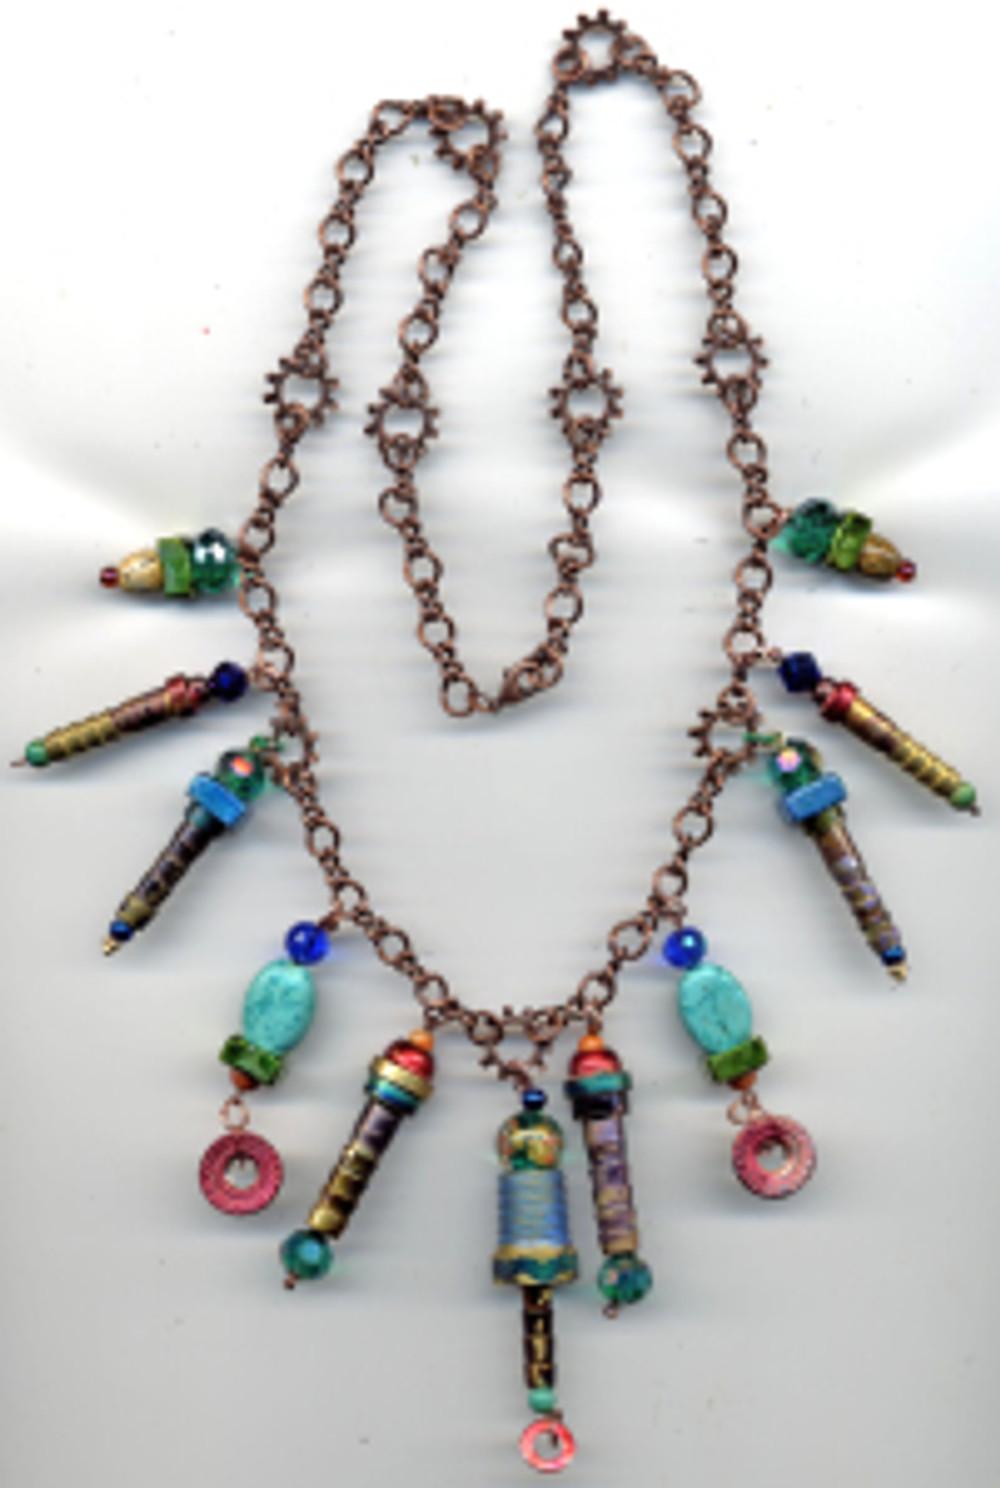 Emerald City - steampunk necklace